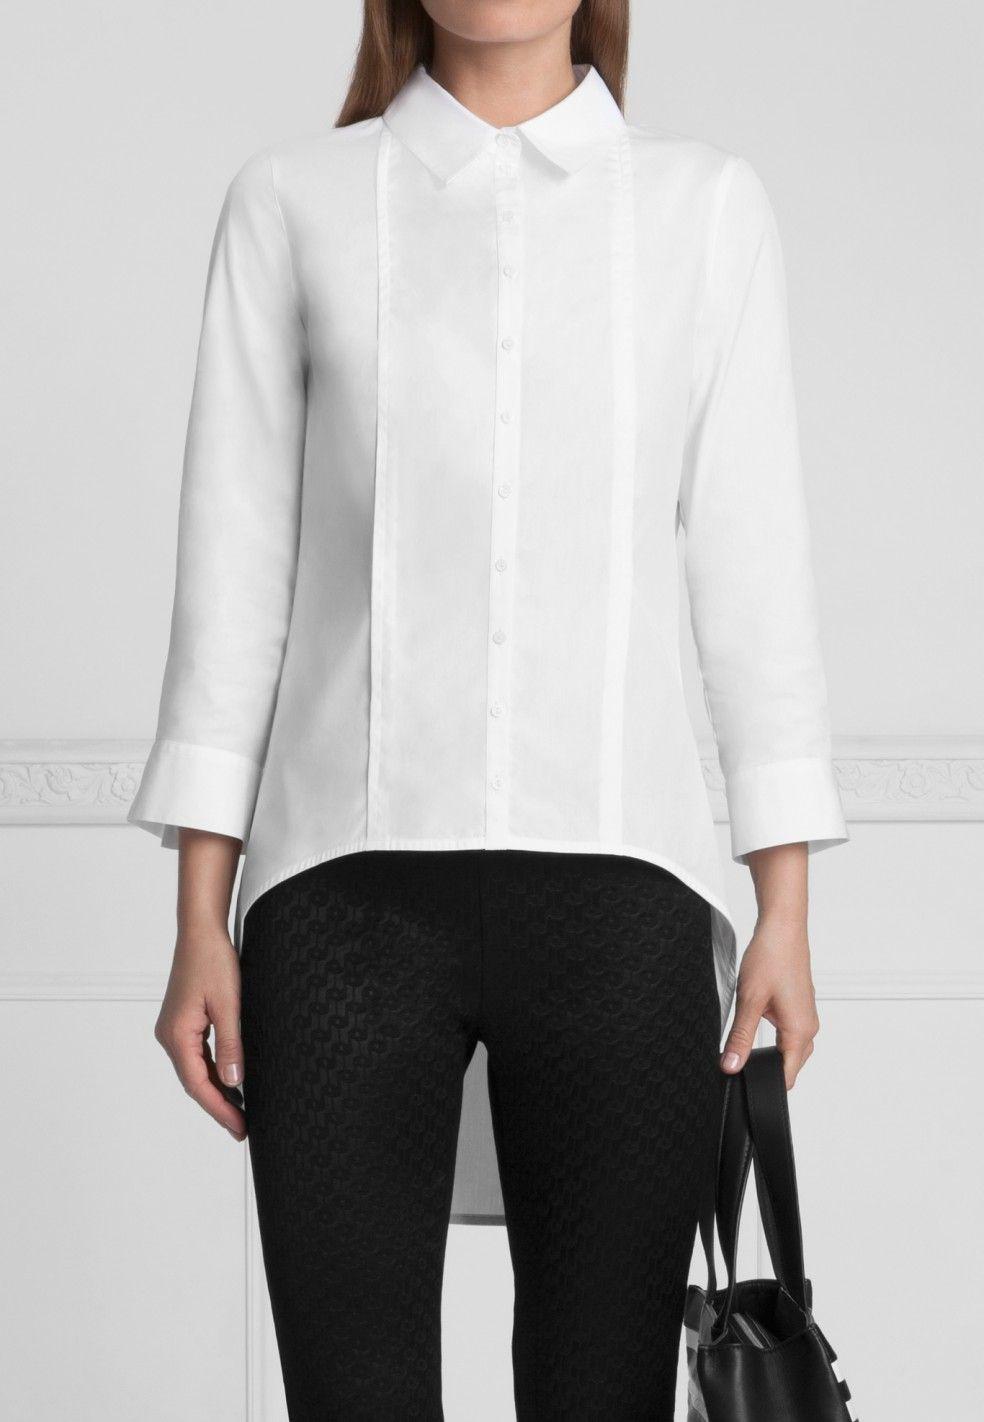 cc4b1184eedcc7 Polly Shirt - Women's White Shirt | Anne Fontaine | shirts white ...